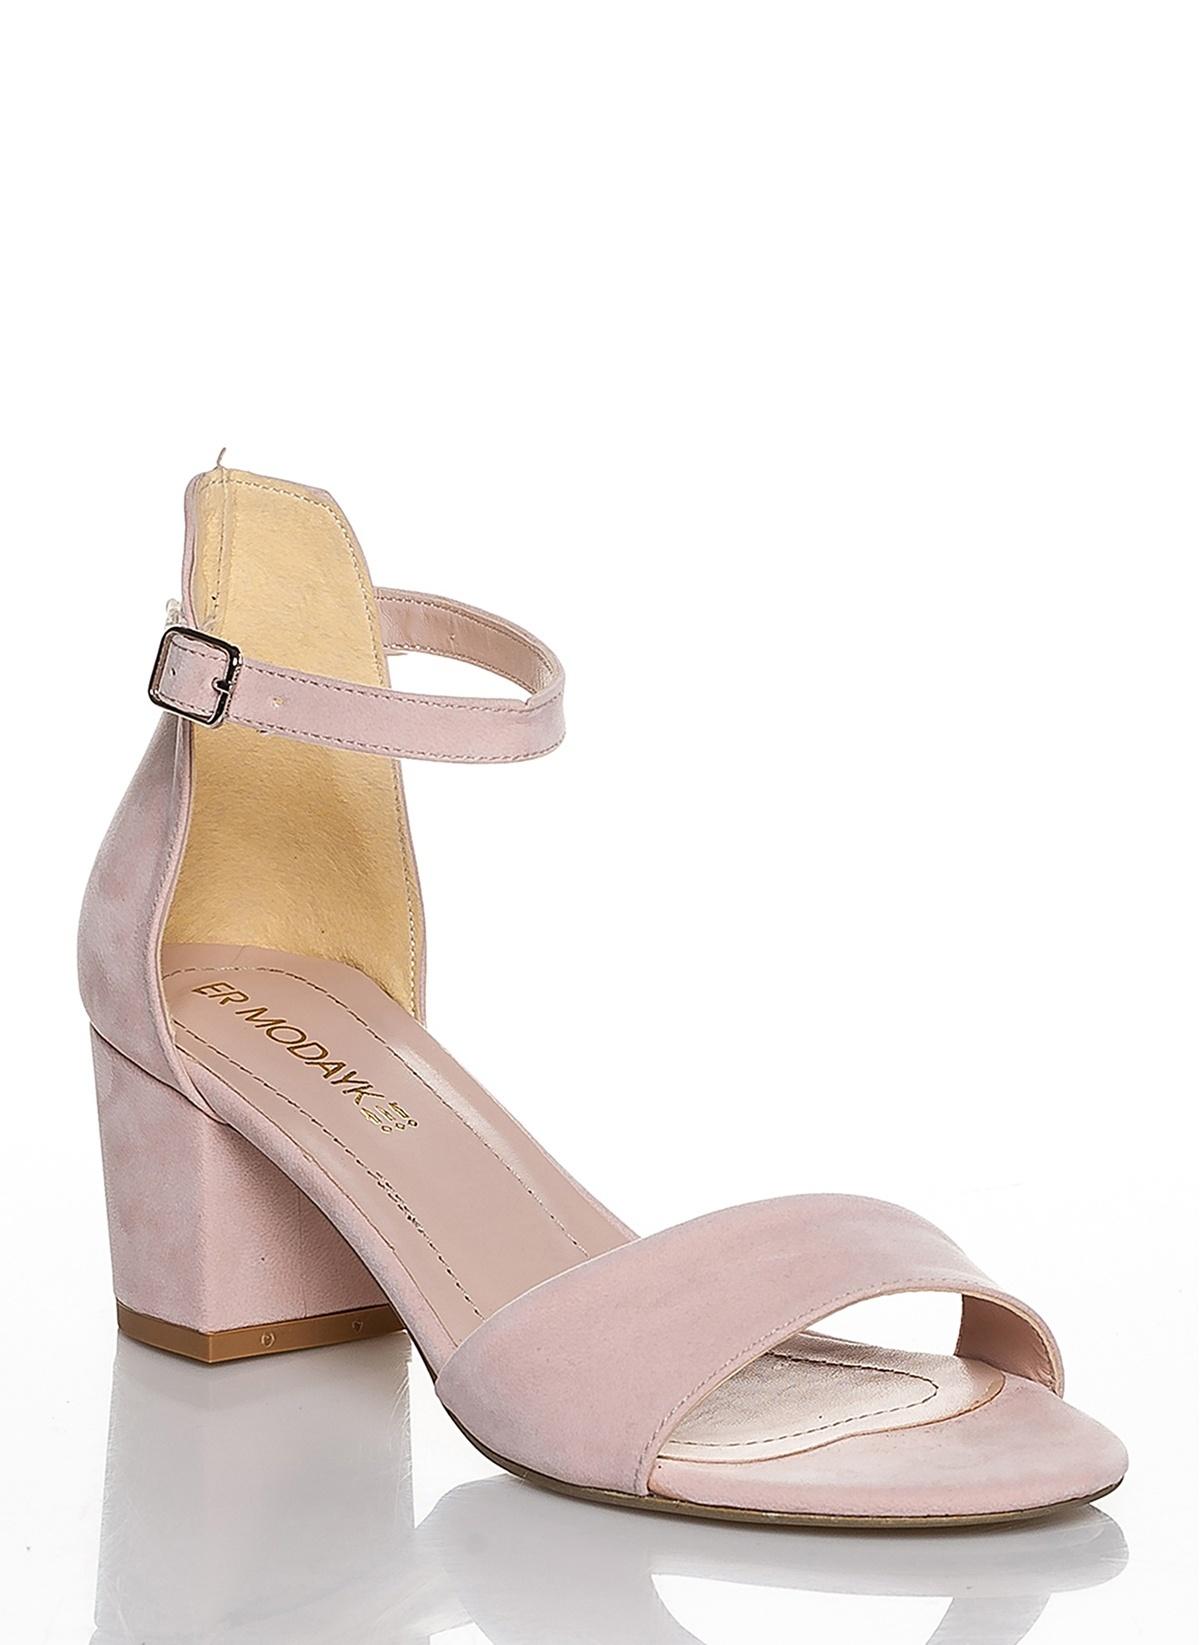 Efem Ayakkabı 19ymd55141 Stiletto – 99.9 TL